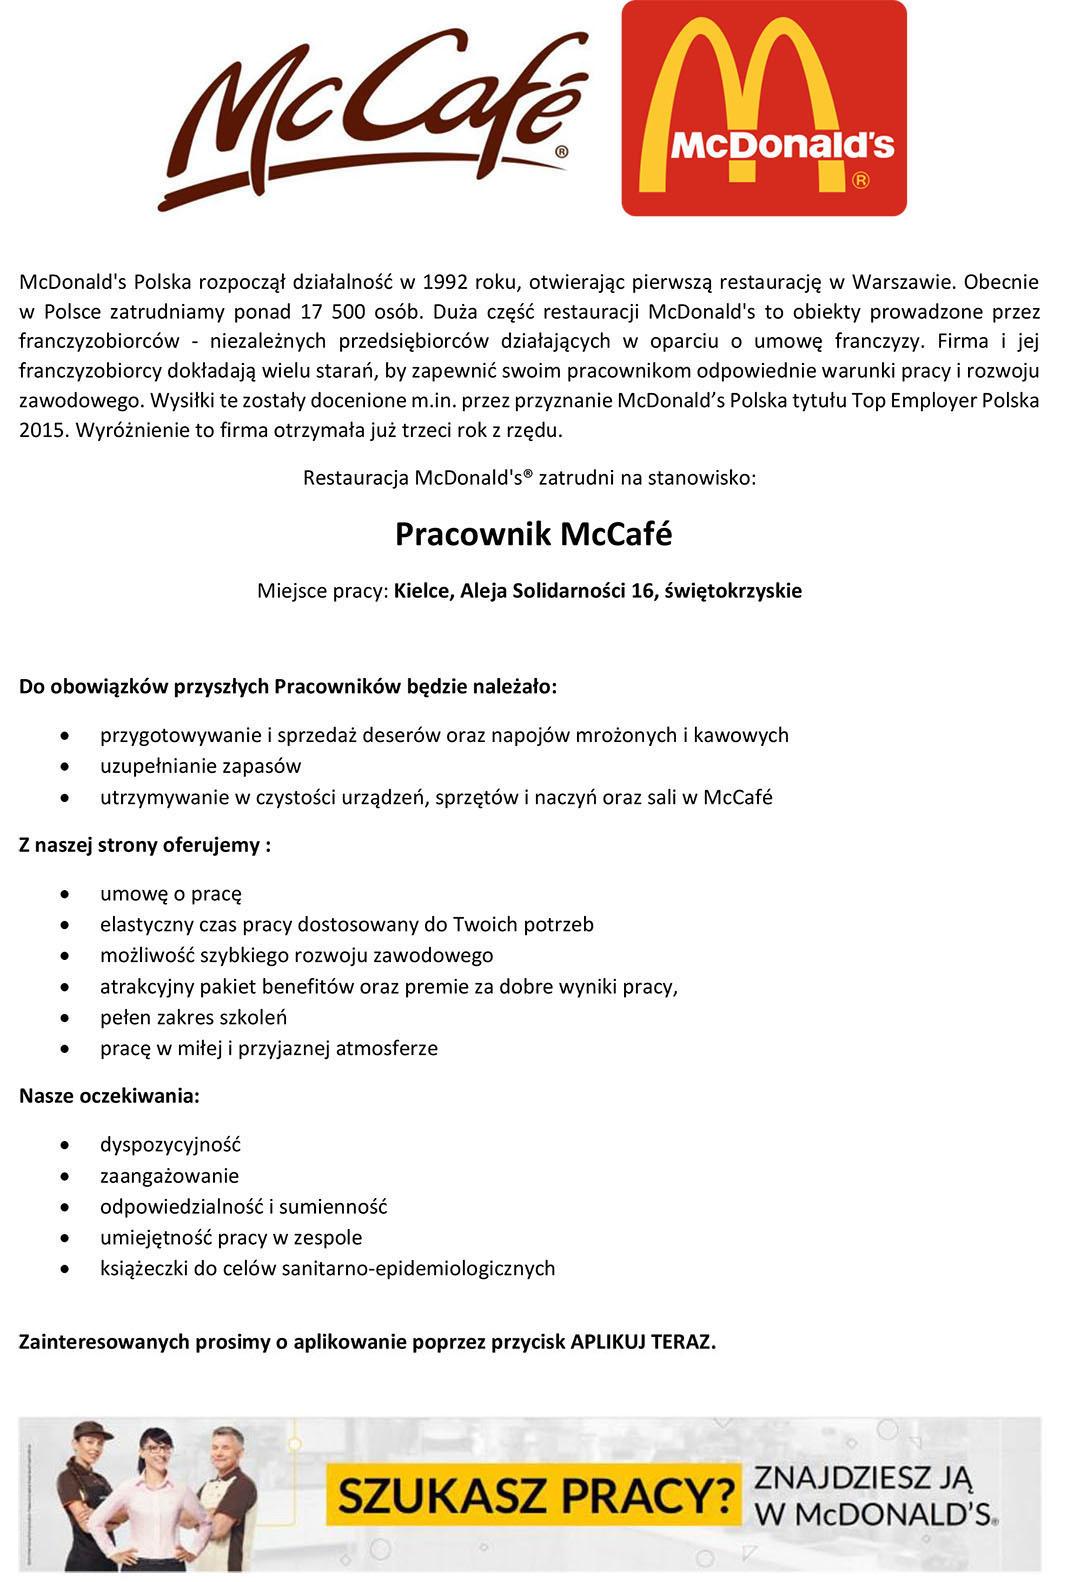 Praca Pracownik Mccaf Mcdonald 39 S Polska Sp Z O O Kielce